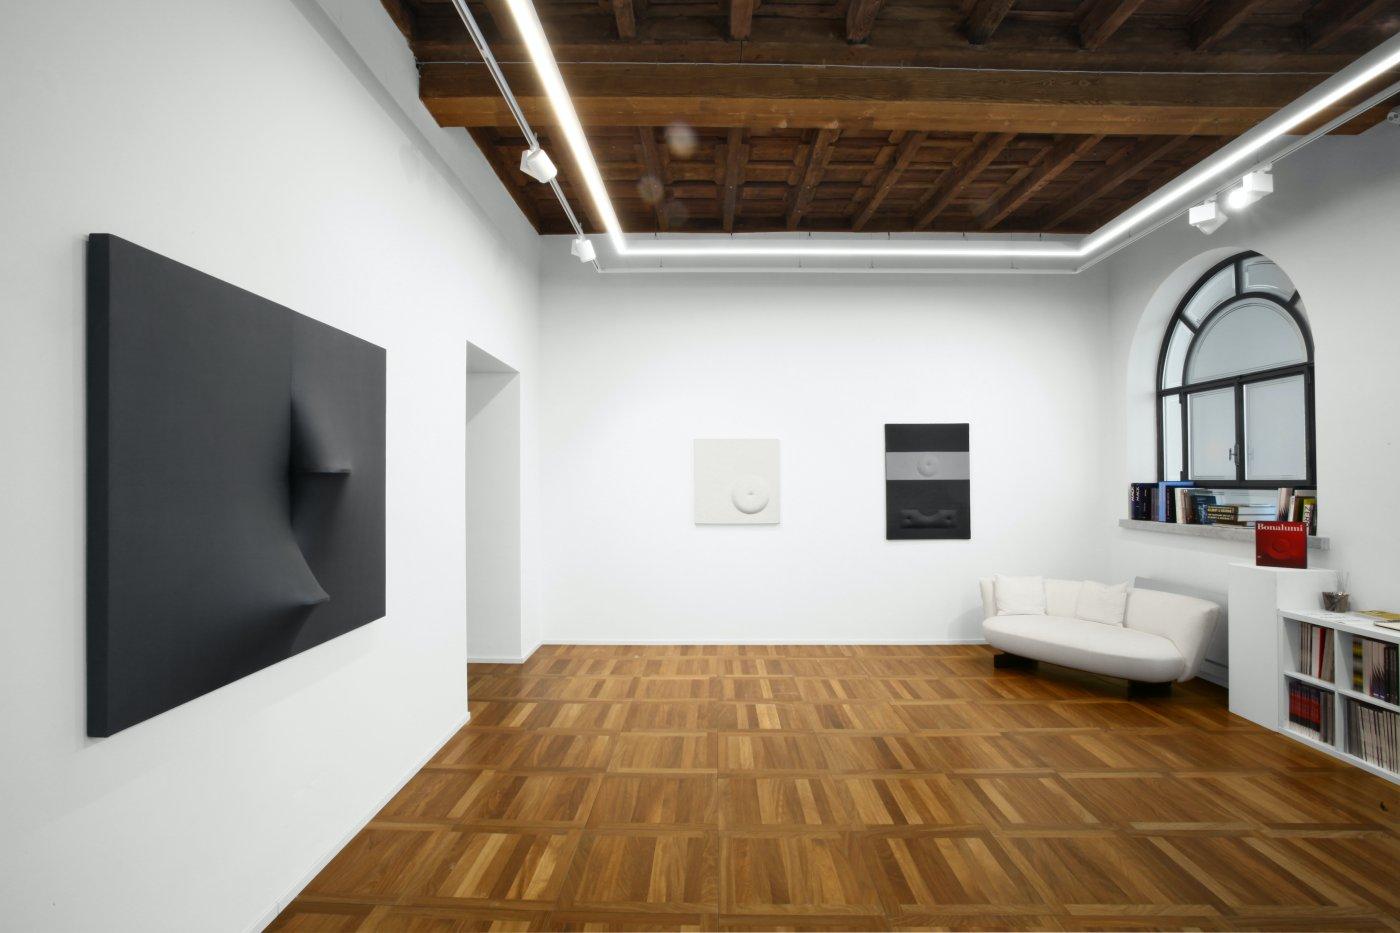 Cortesi Gallery Milan Agostino Bonalumi 2